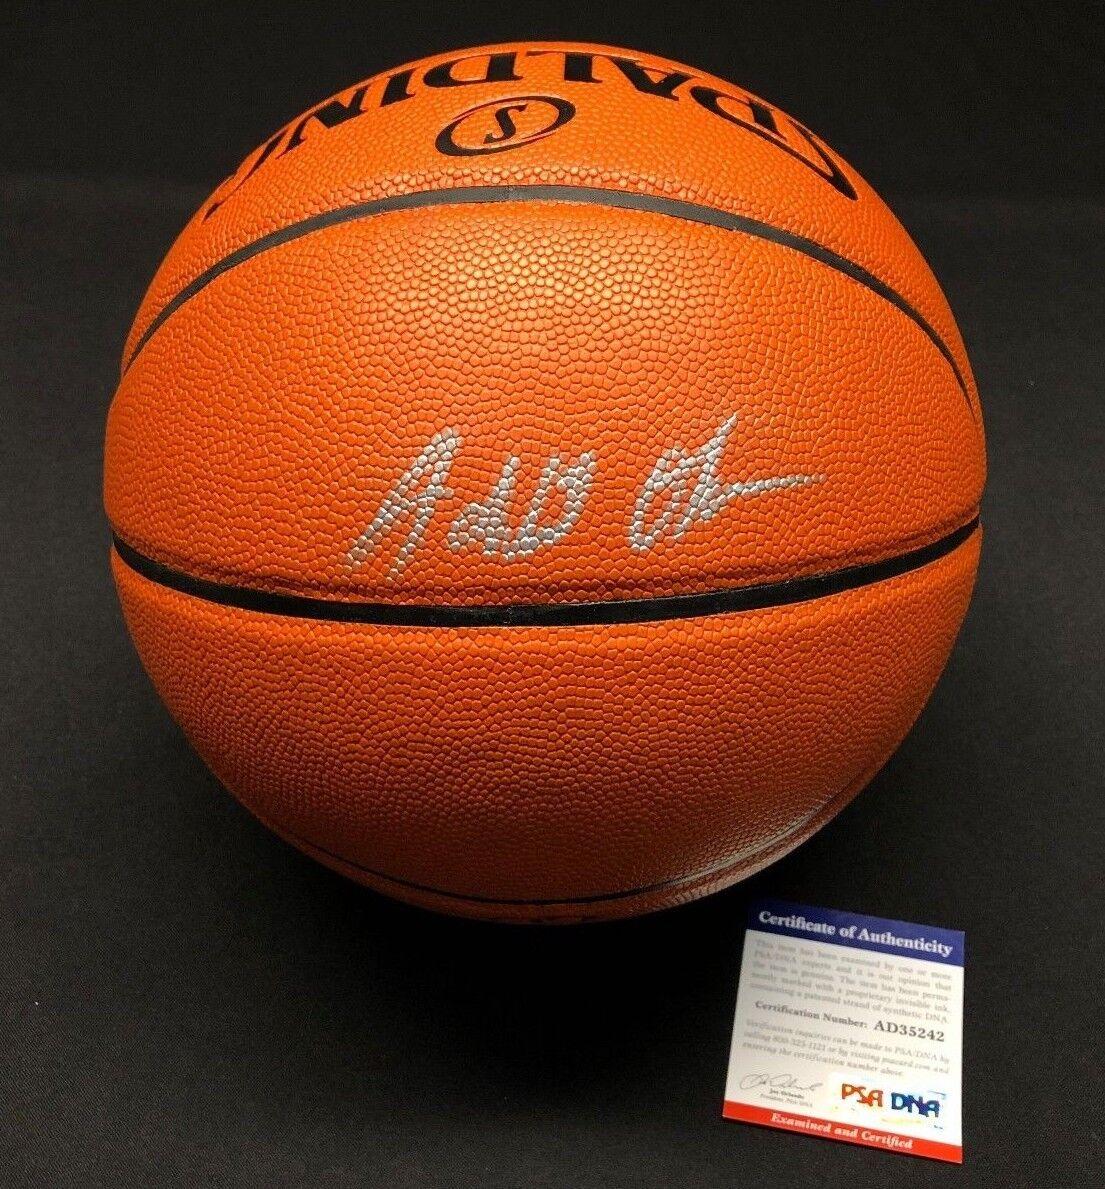 Jahlil Okafor Signed Spalding Game Ball Series Basketball *Nets PSA AD35242